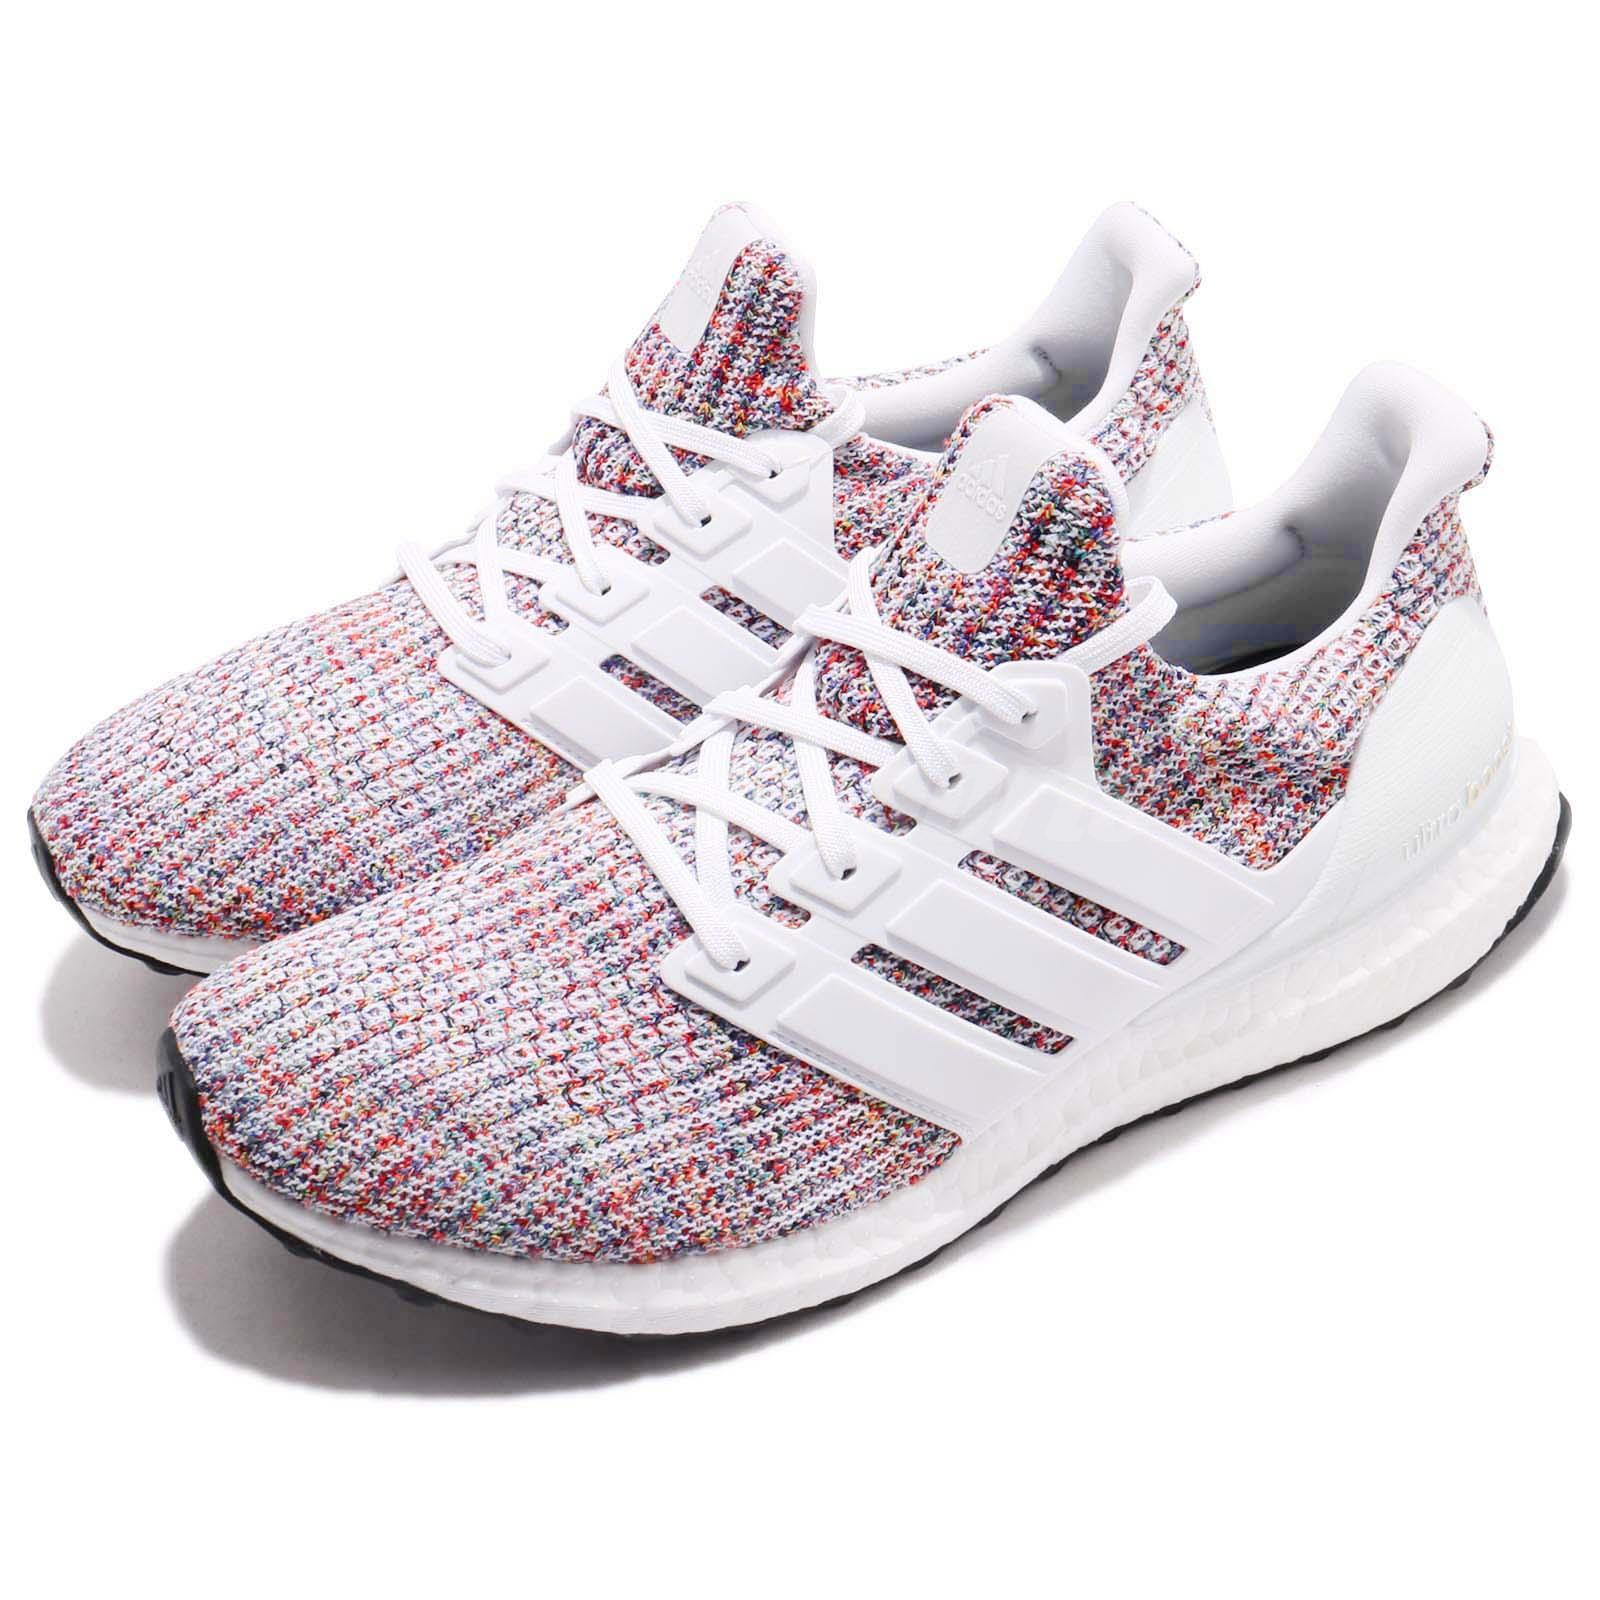 timeless design e2e17 36b88 Details about adidas UltraBOOST 4.0 Rainbow Multi Color White Men Running  Shoes Sneaker CM8111